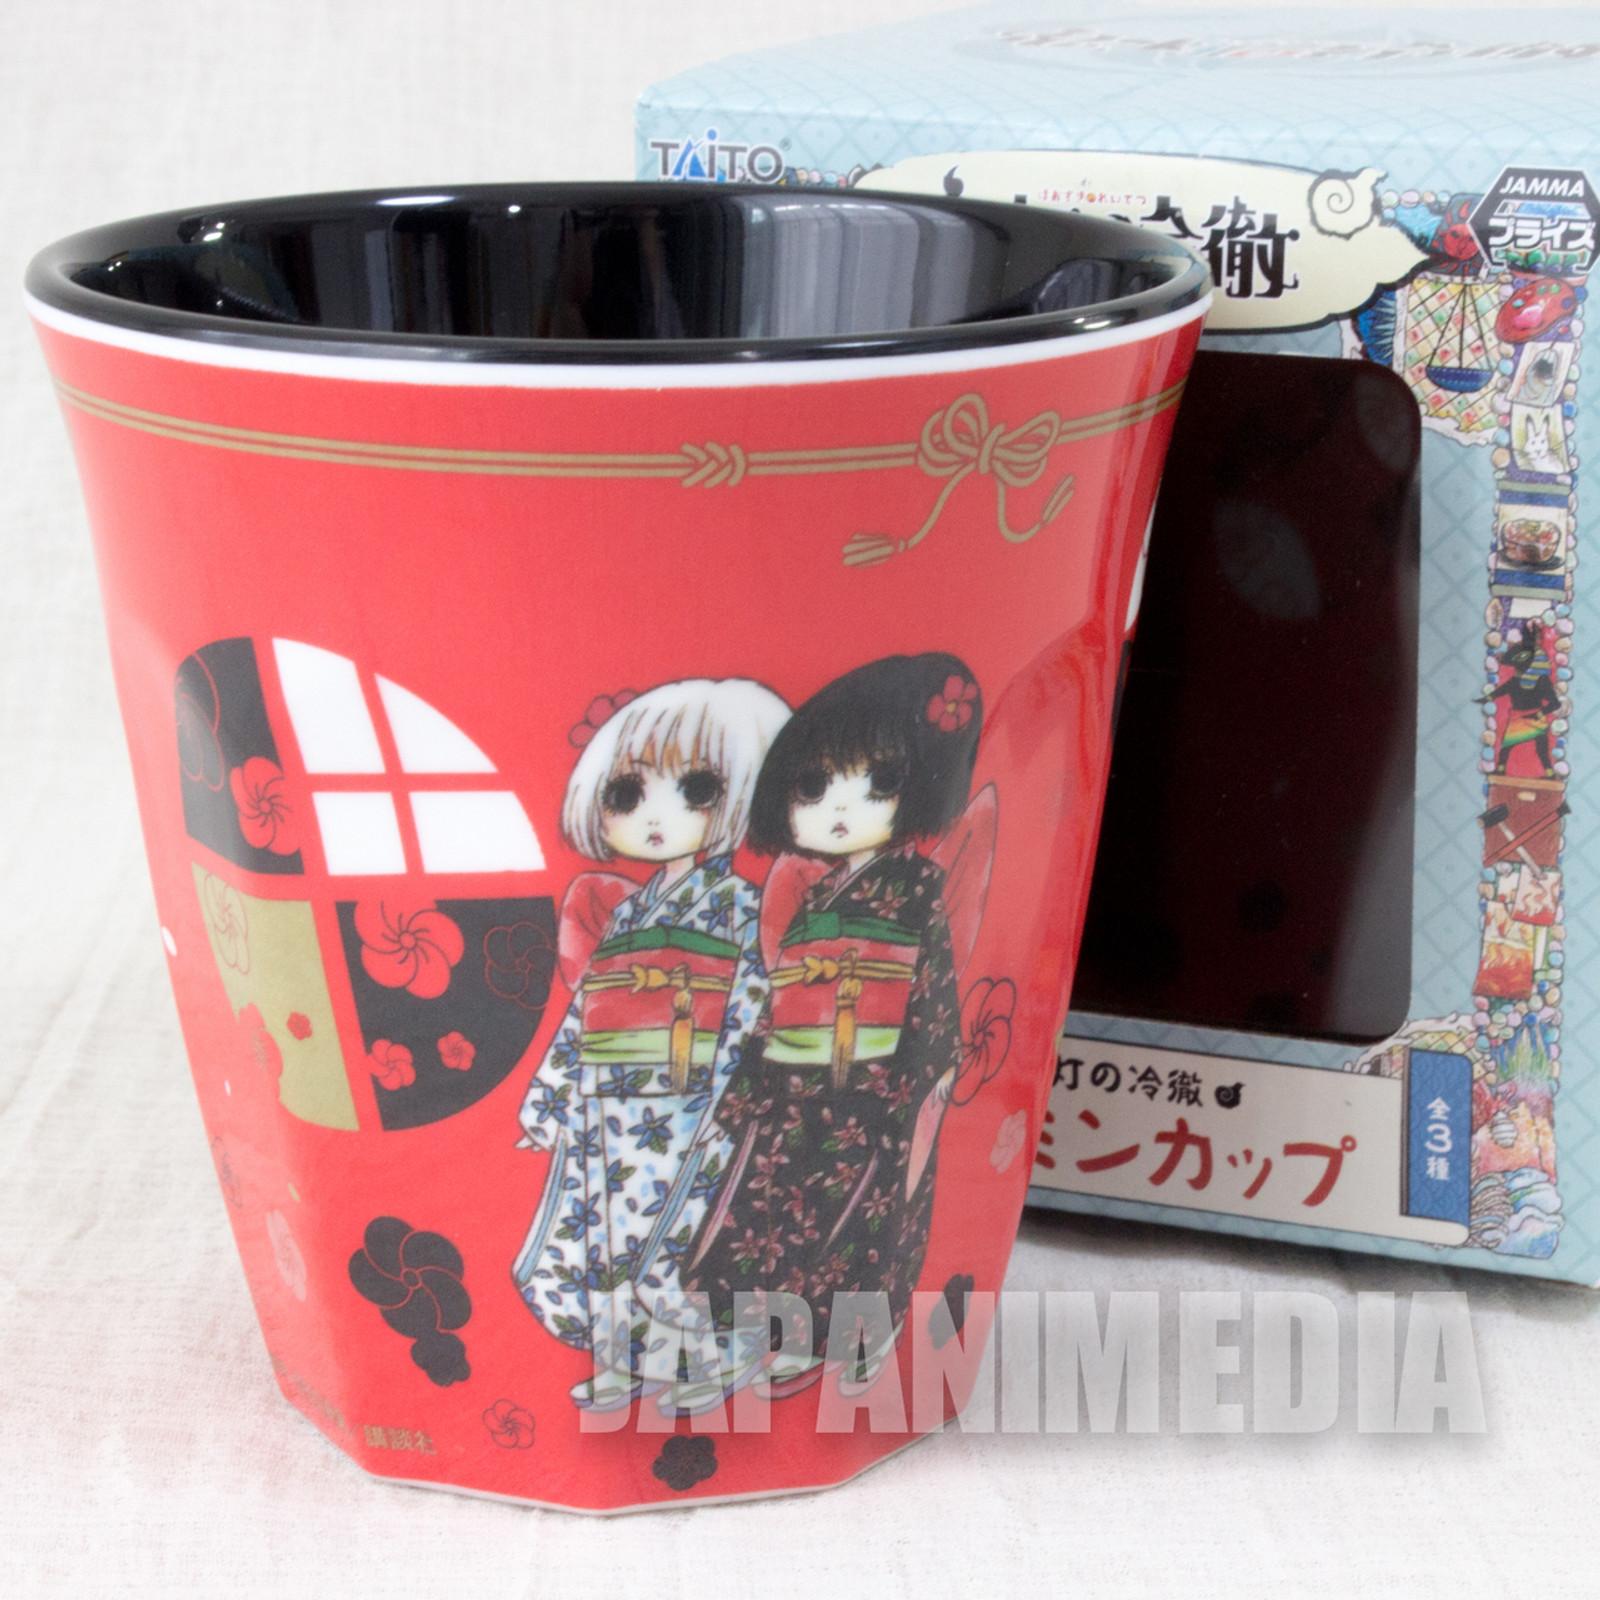 Hozuki no Reitetsu Melamine Art Cup Ichiko & Niko Ver. Taito JAPAN ANIME